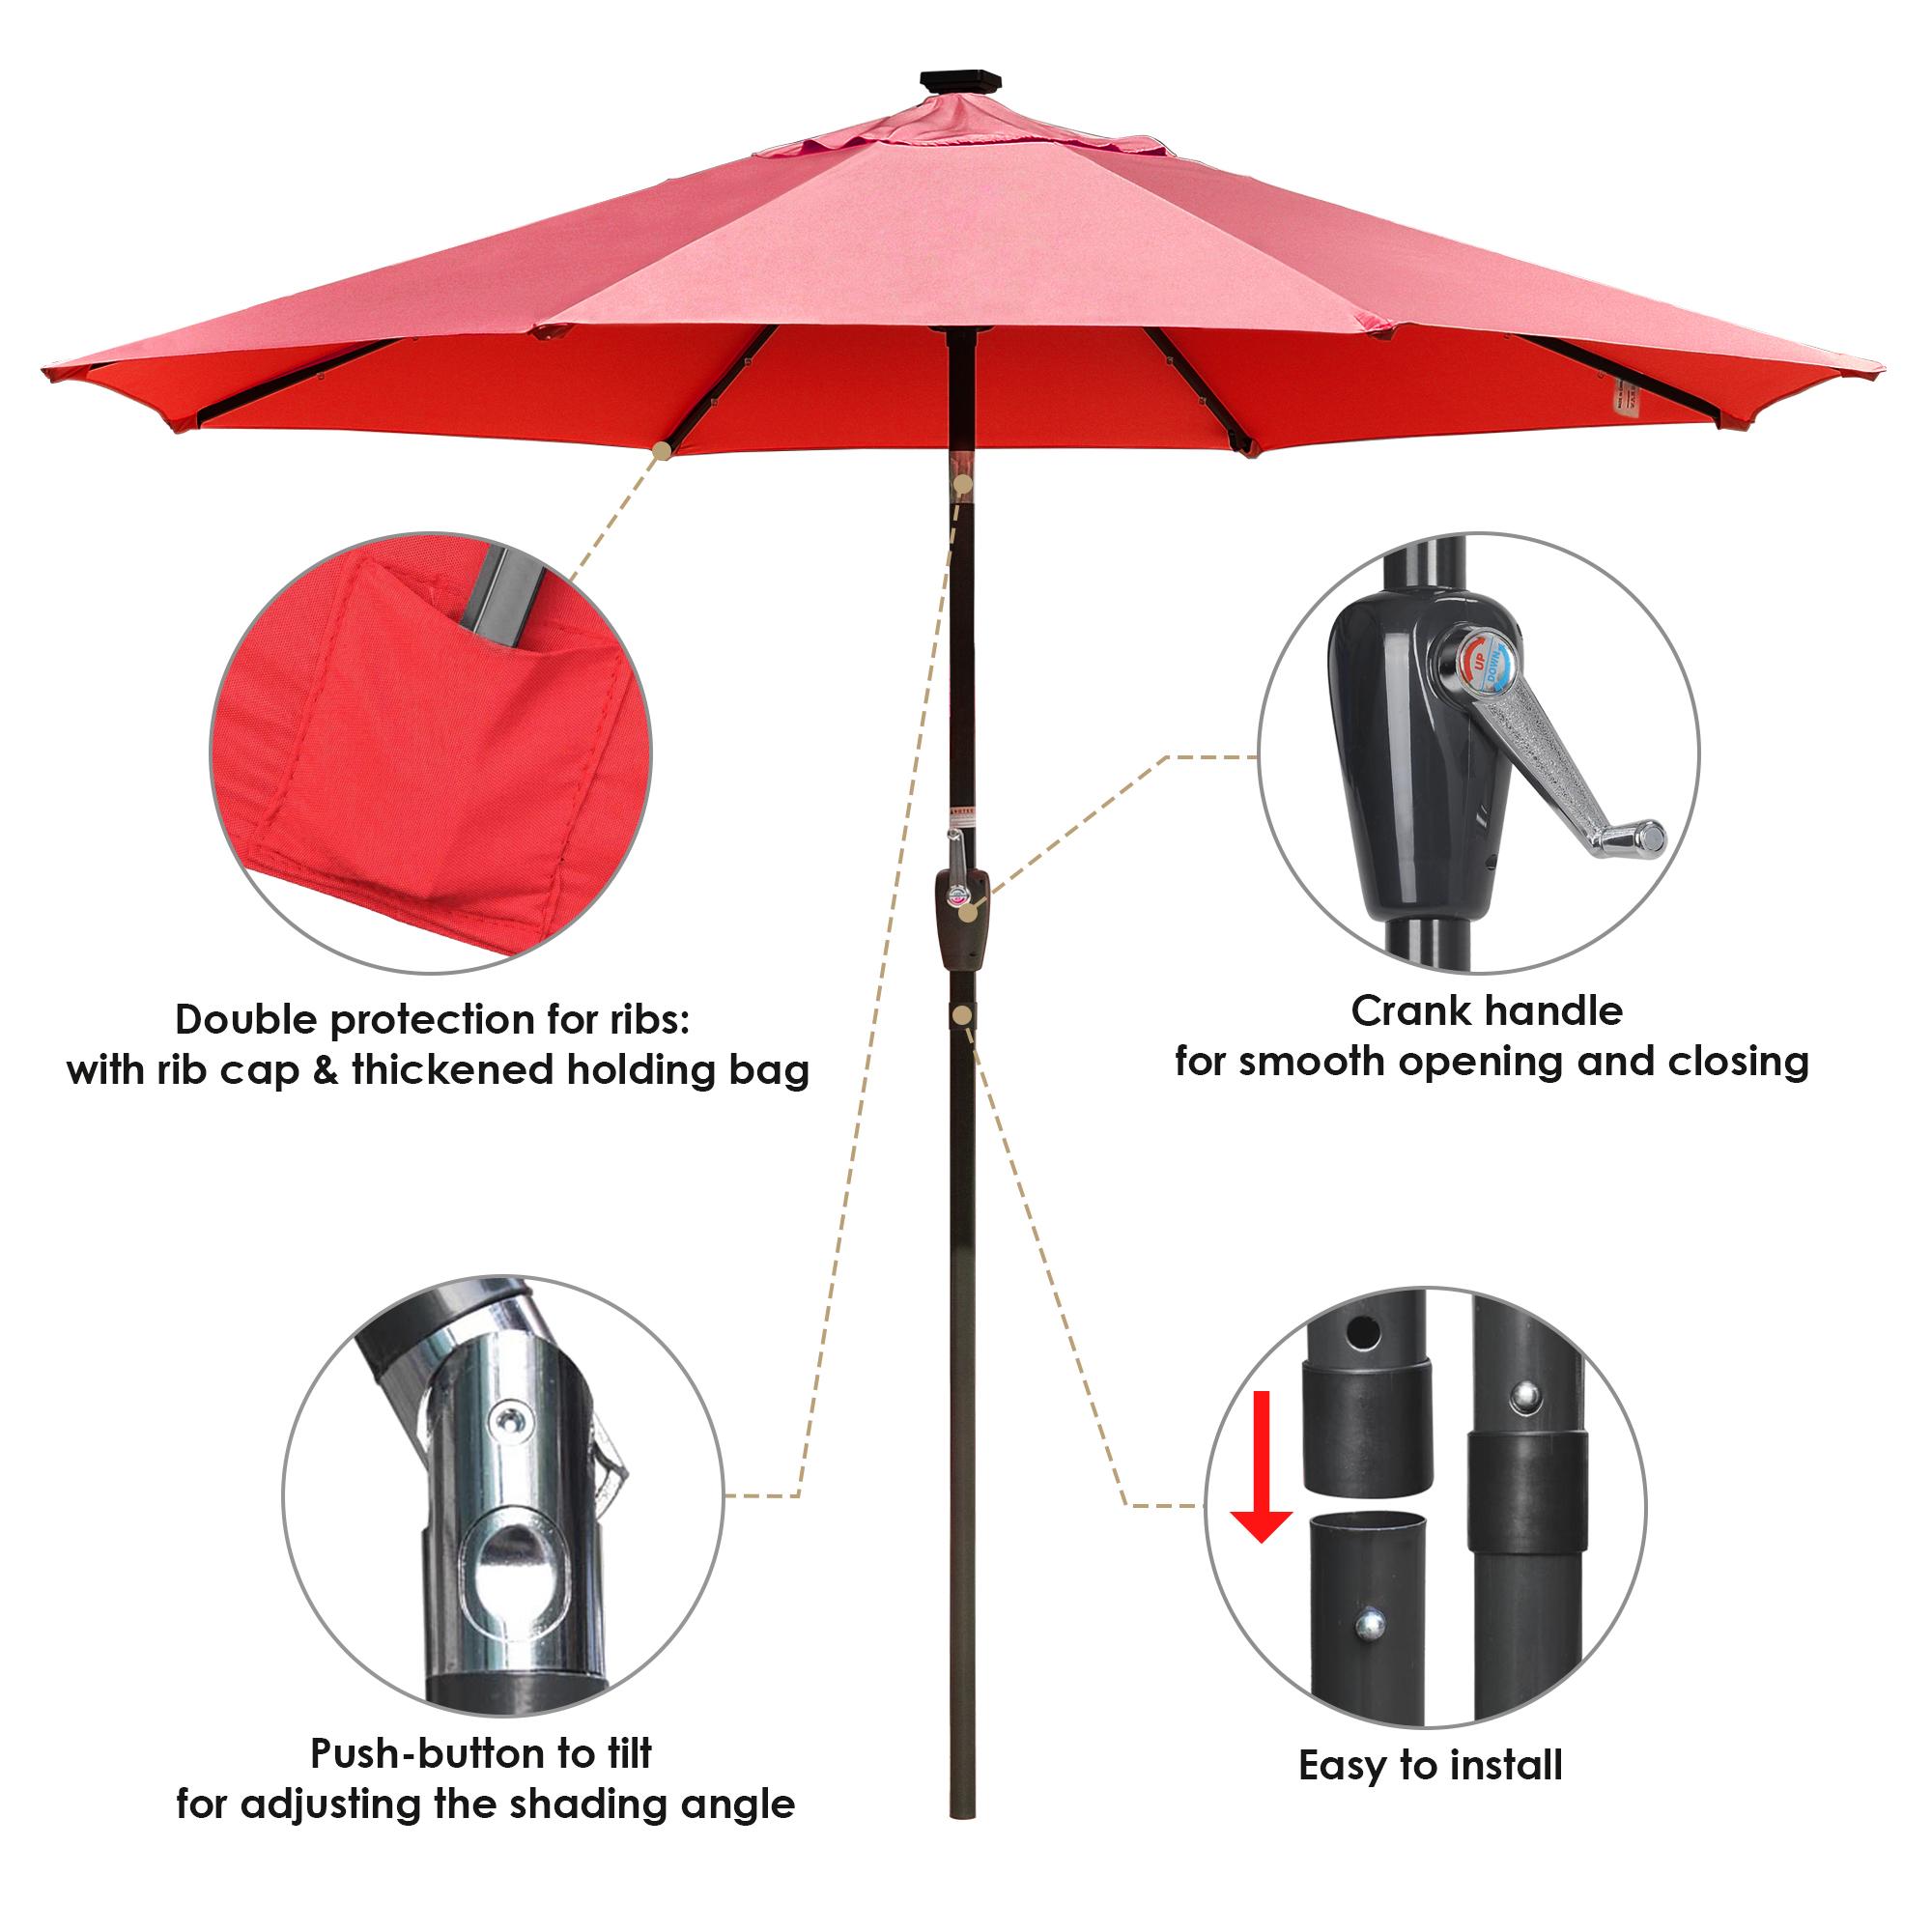 thumbnail 58 - 9' Patio Outdoor Umbrella Solar LED 8 Rib Garden Parasol Yard Deck Table Shade